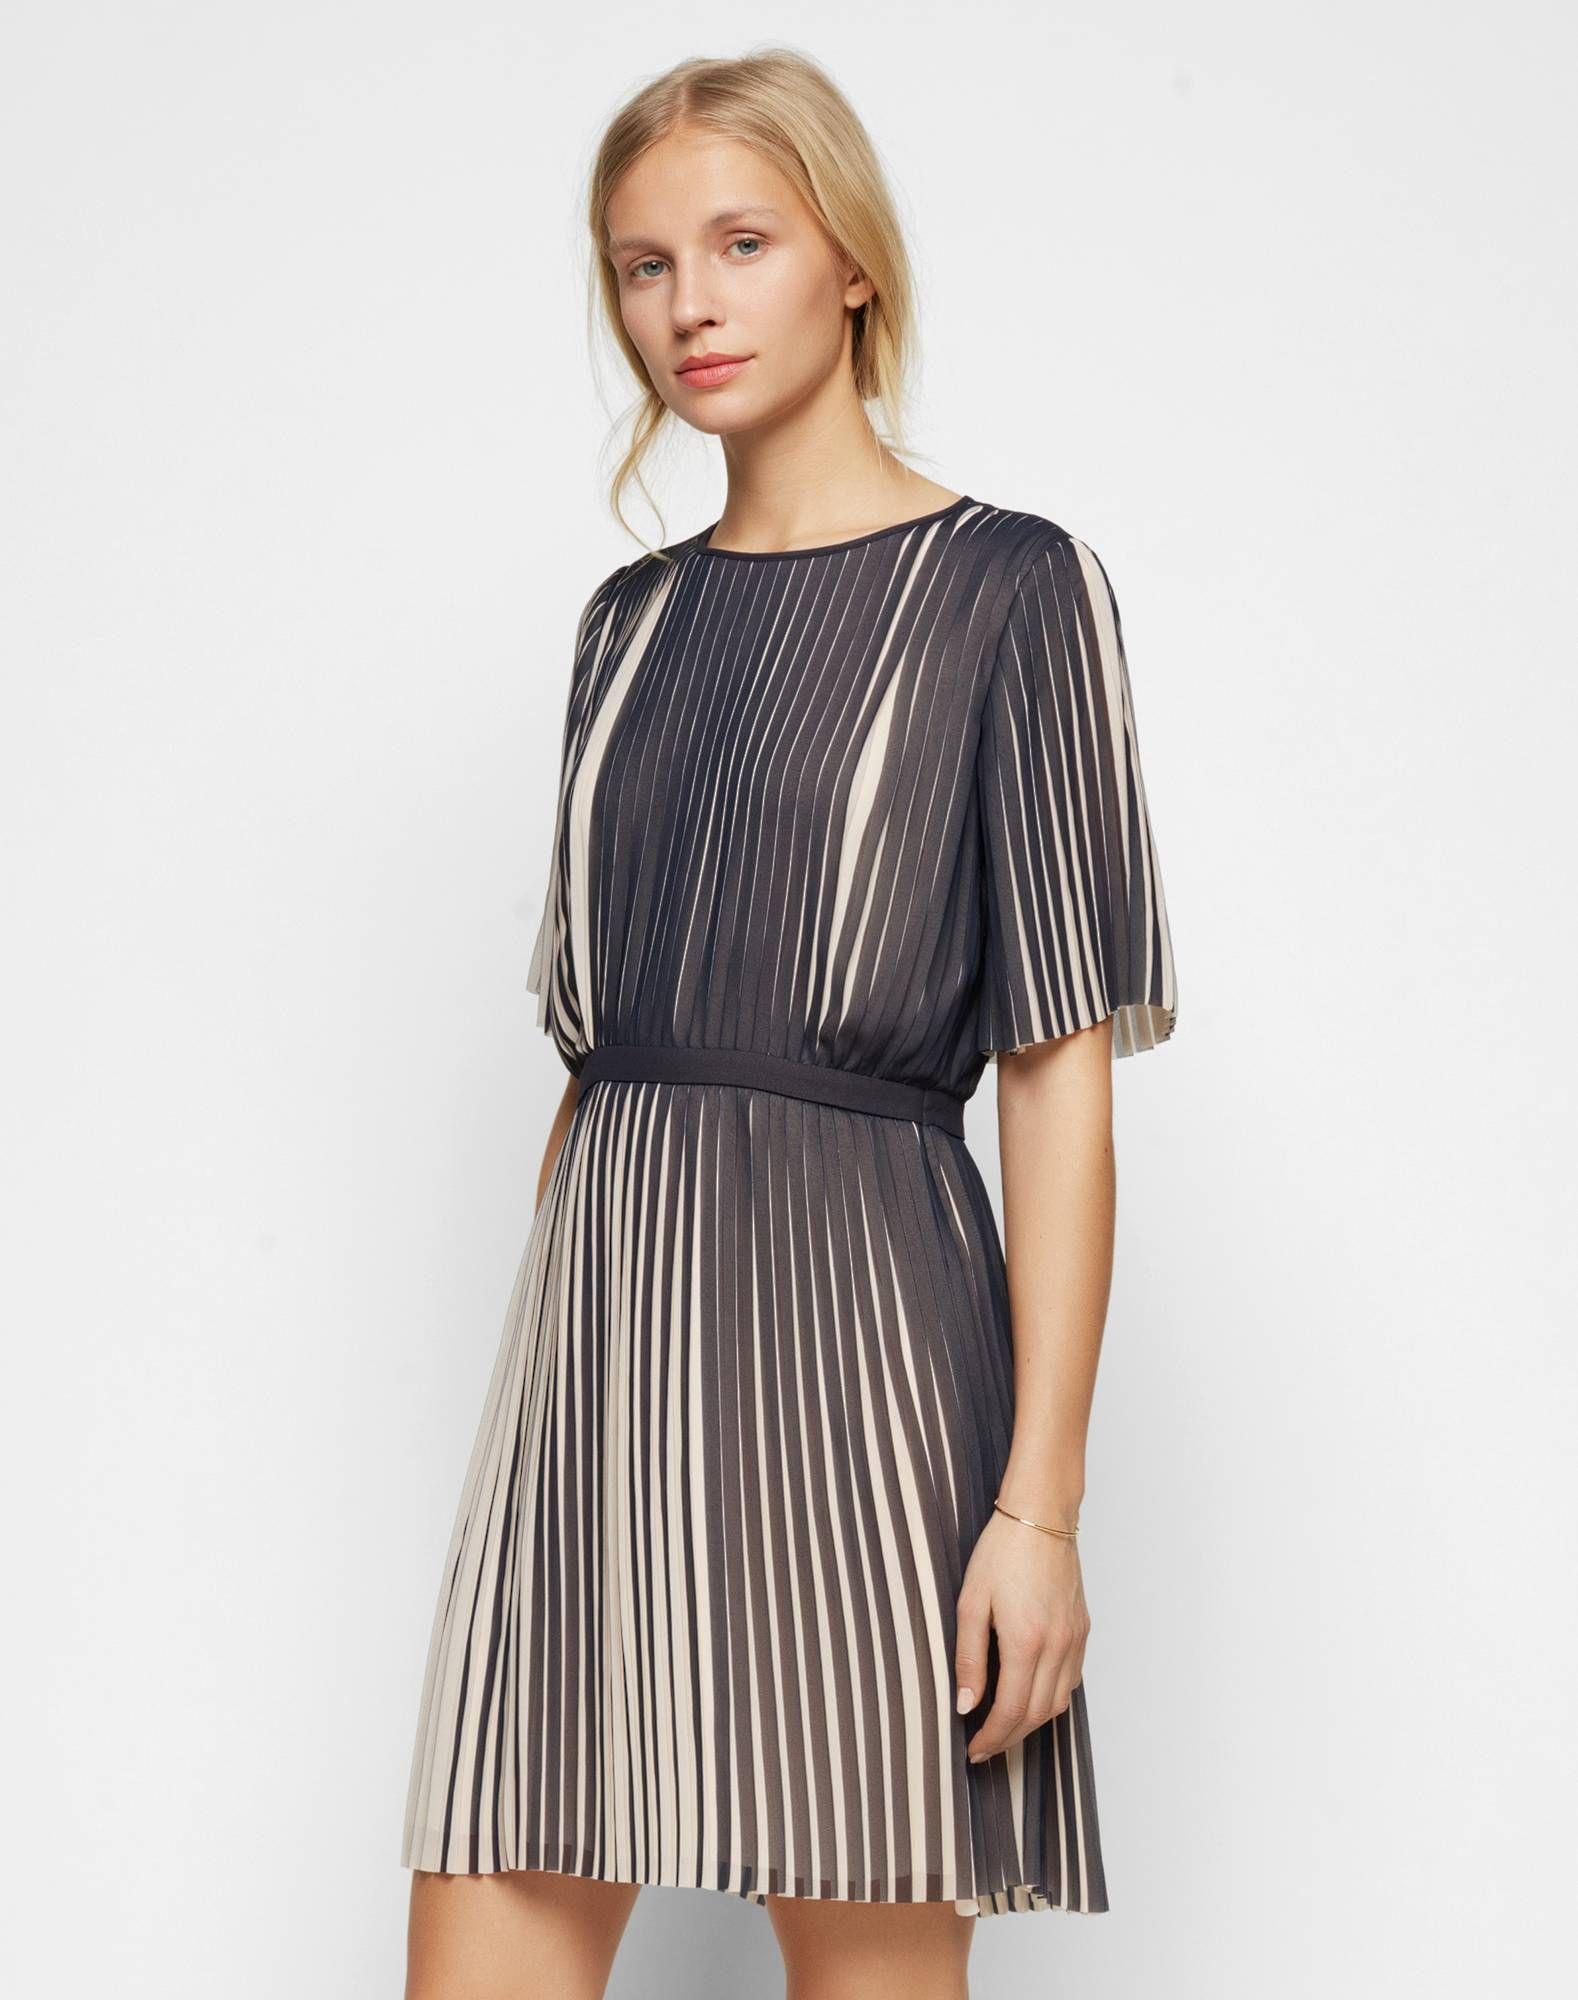 Plissee-Kleid \'Lou\' | Что надеть | Pinterest | Plissee kleid und Plissee